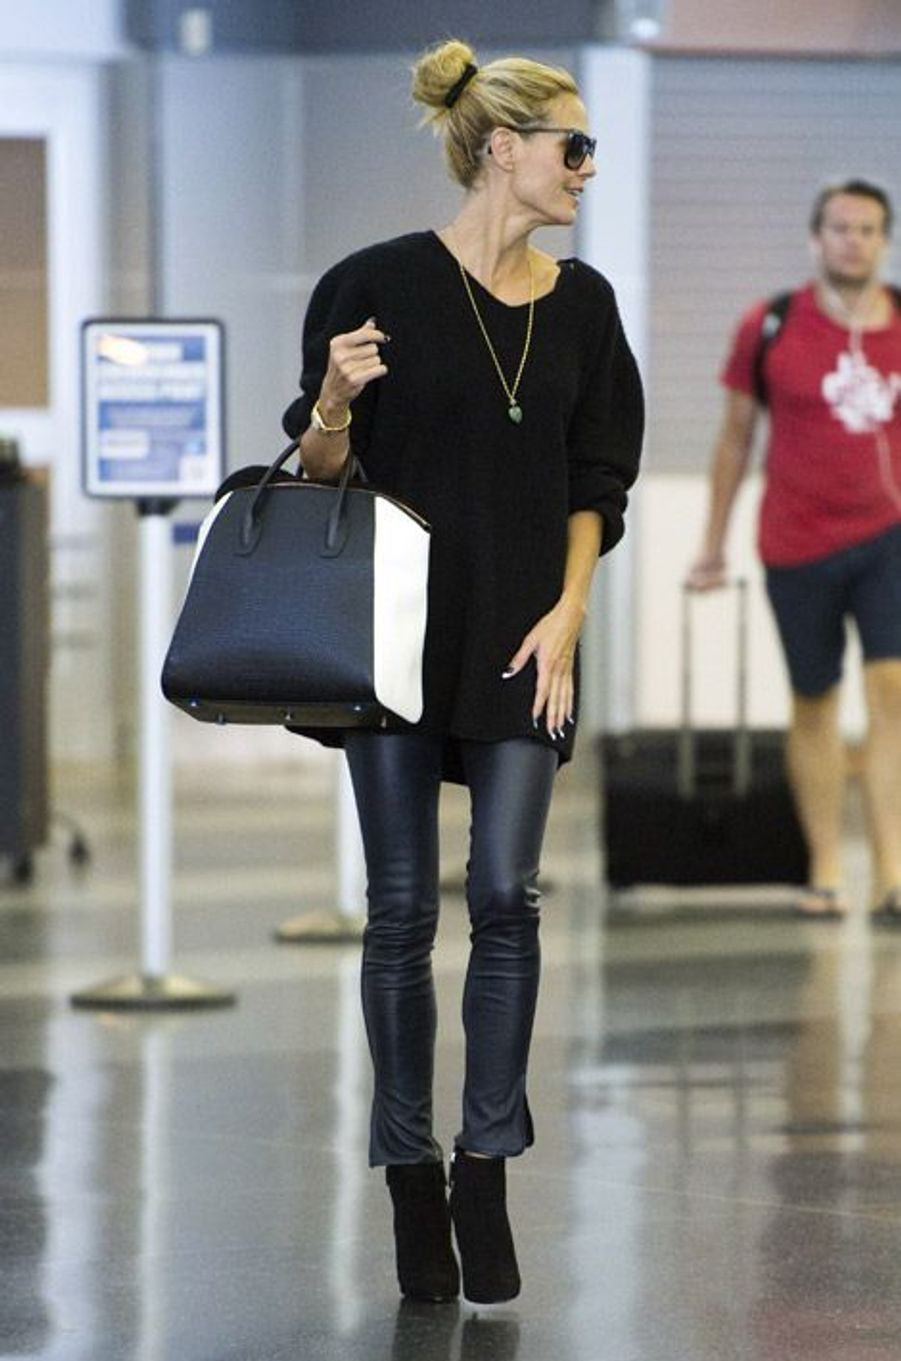 Le top model Heidi Klum à l'aéroport JFK de New York, le 15 septembre 2014